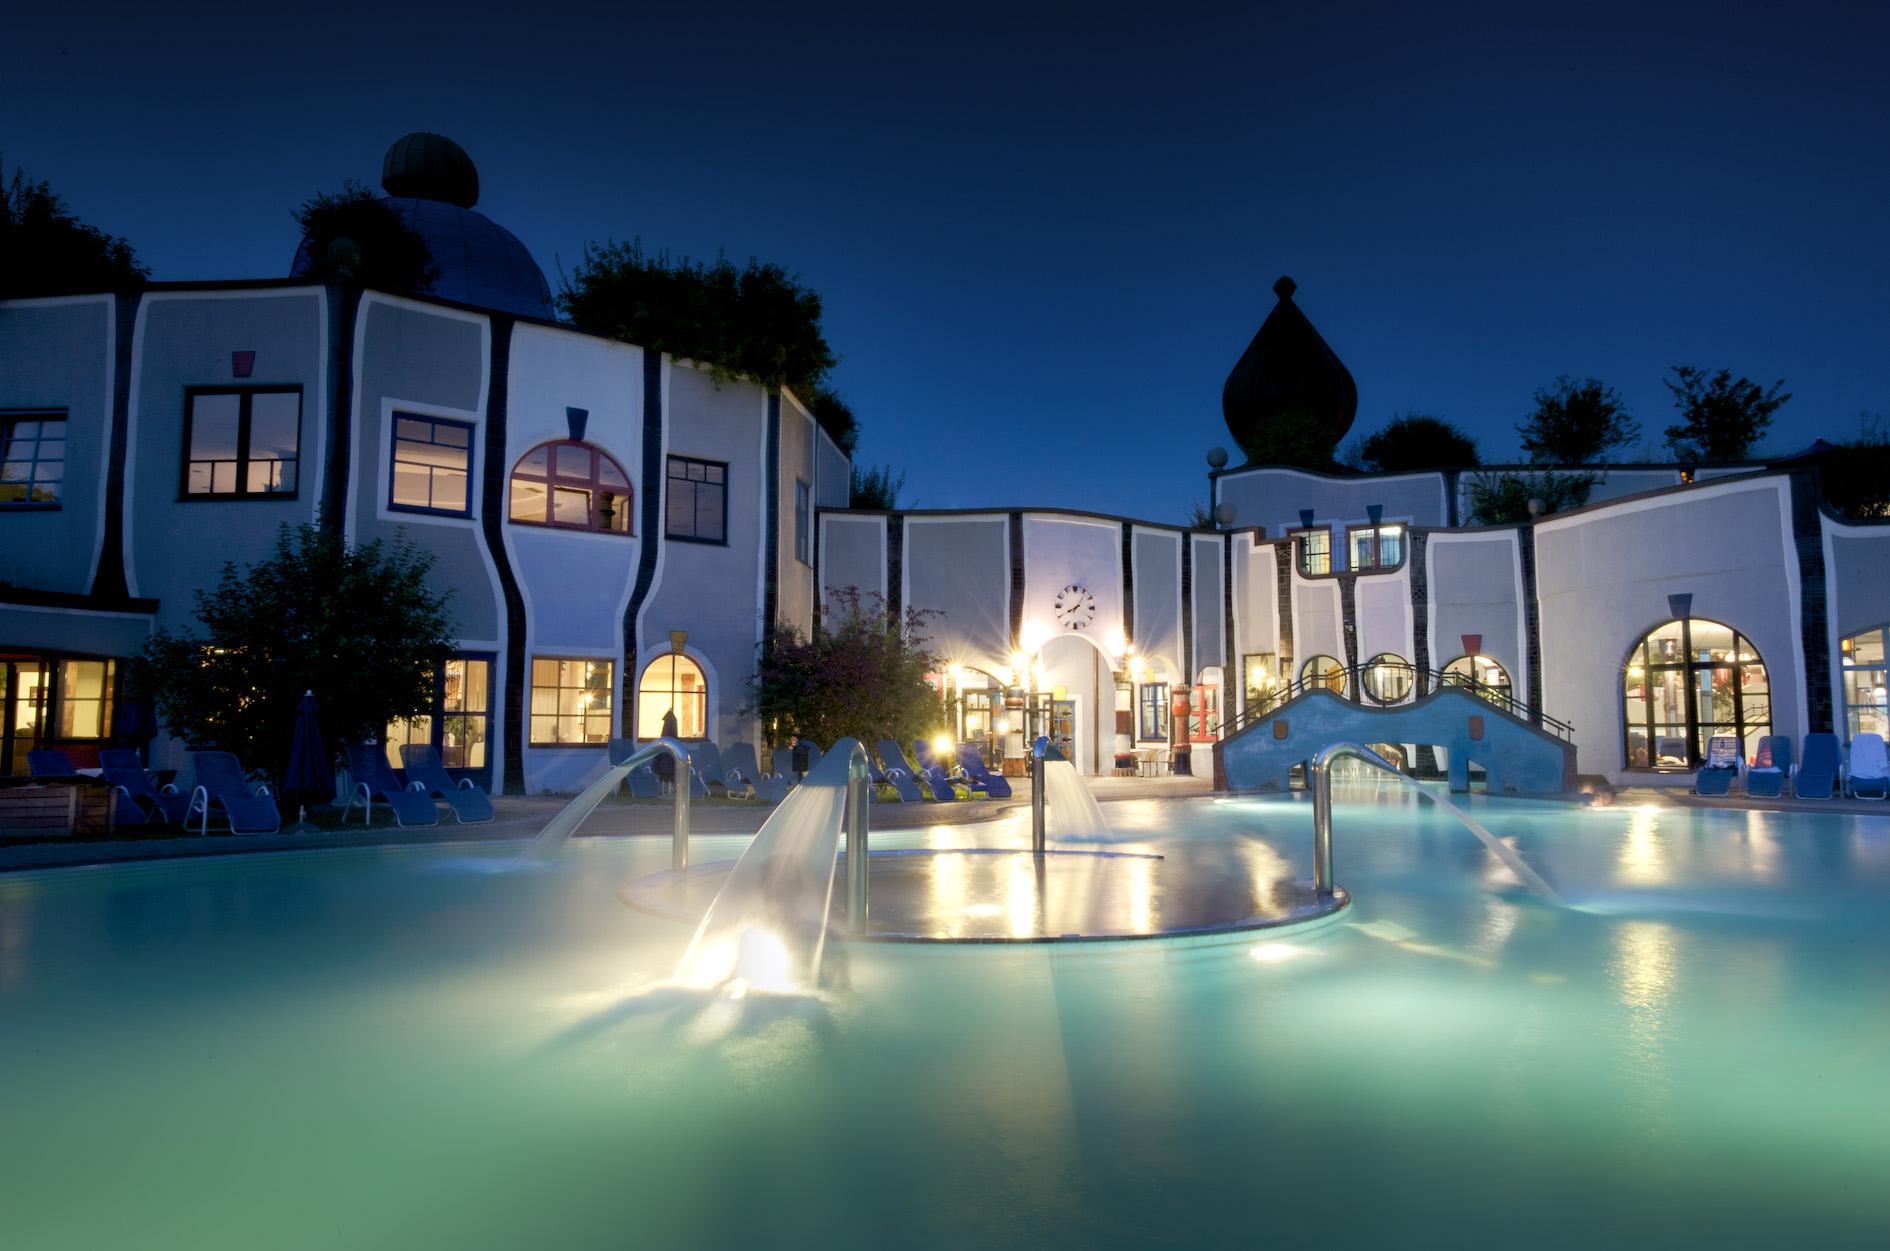 Hotel_Therme_Rogner_Bad_Blumau_Nacht